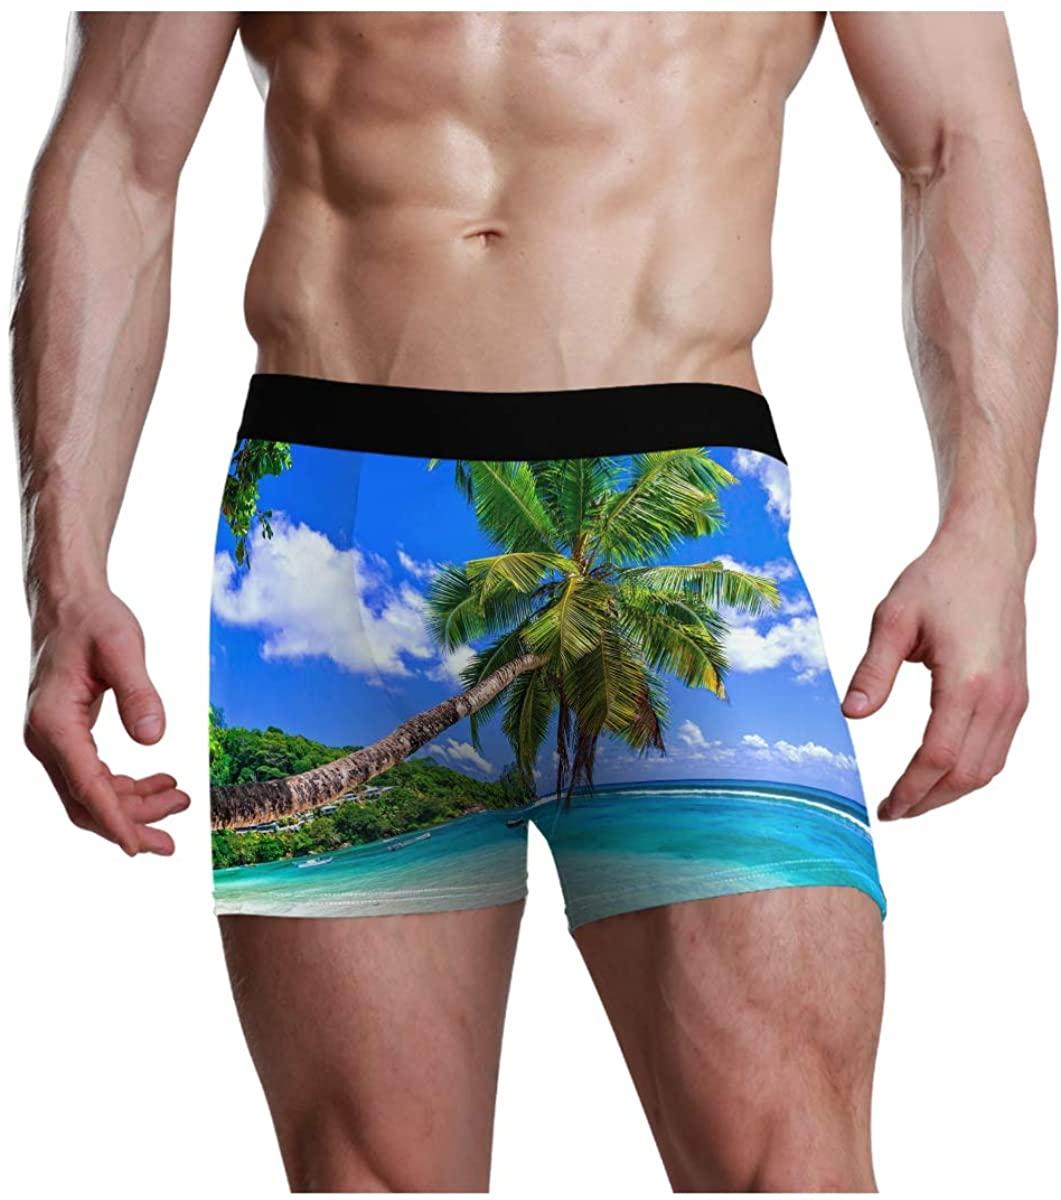 CaTaKu Tropical Tree Beach Men's Boxer Briefs Underwear S-XL